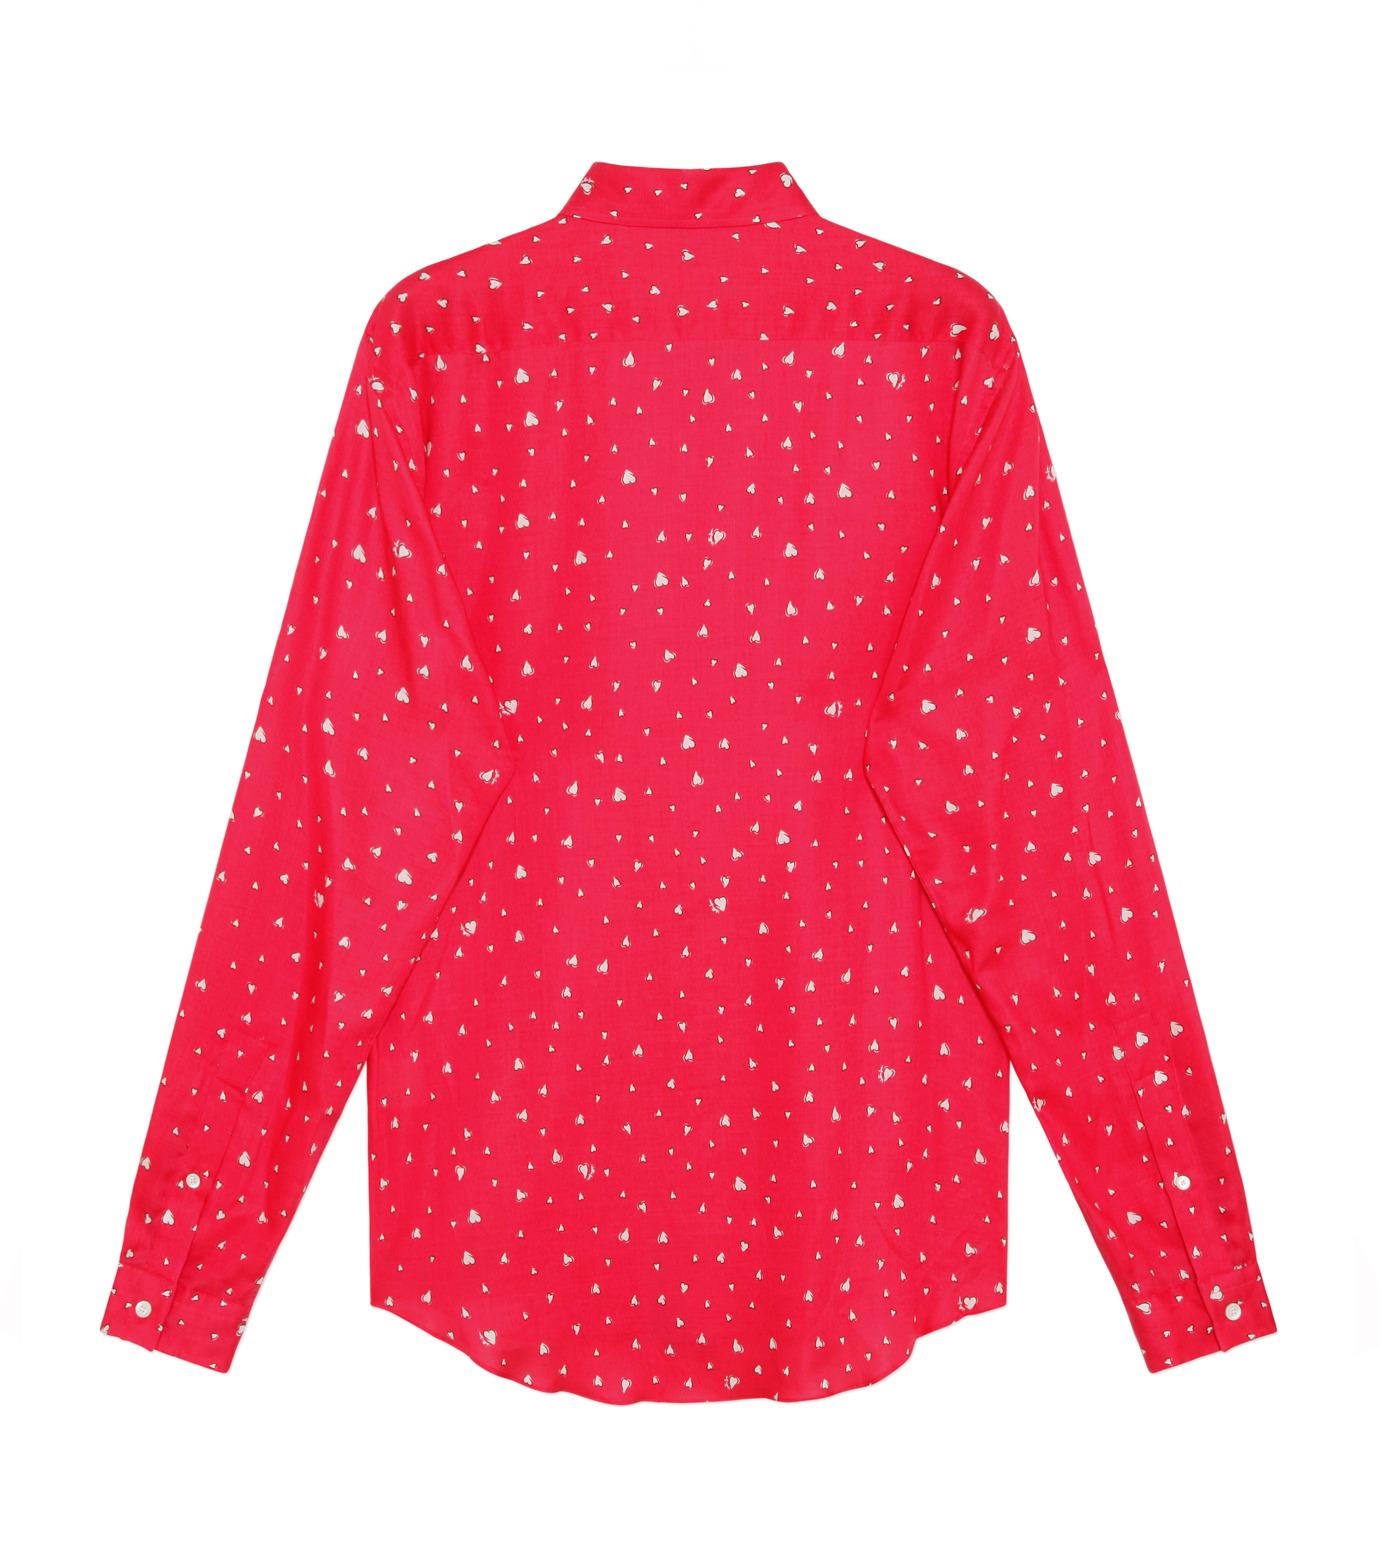 HL HEDDIE LOVU(エイチエル・エディールーヴ)のHEART PATTERN SHIRT-PINK(シャツ/shirt)-18S93001-72 拡大詳細画像2